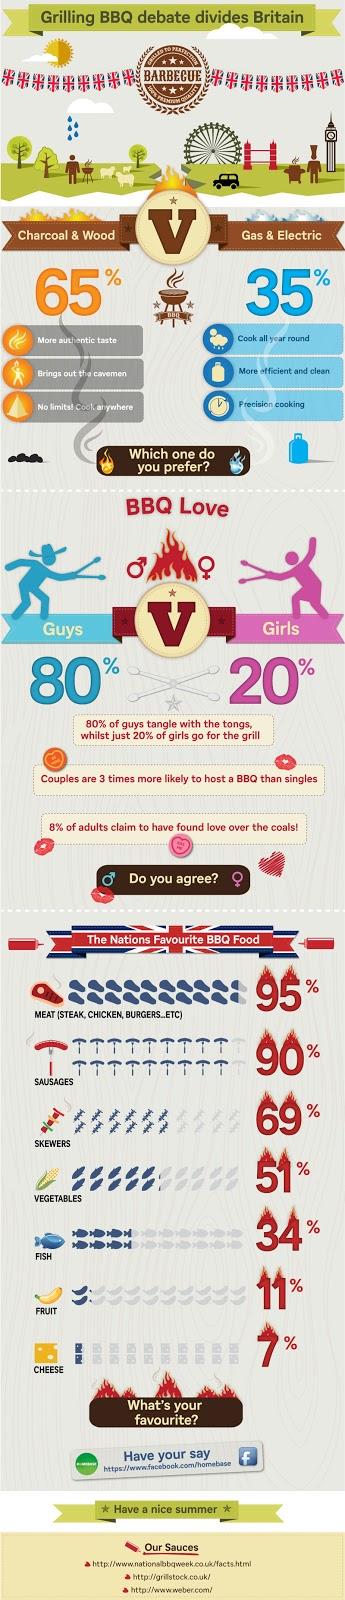 Homebase Grilling BBQ Debate Divides Britain infographic